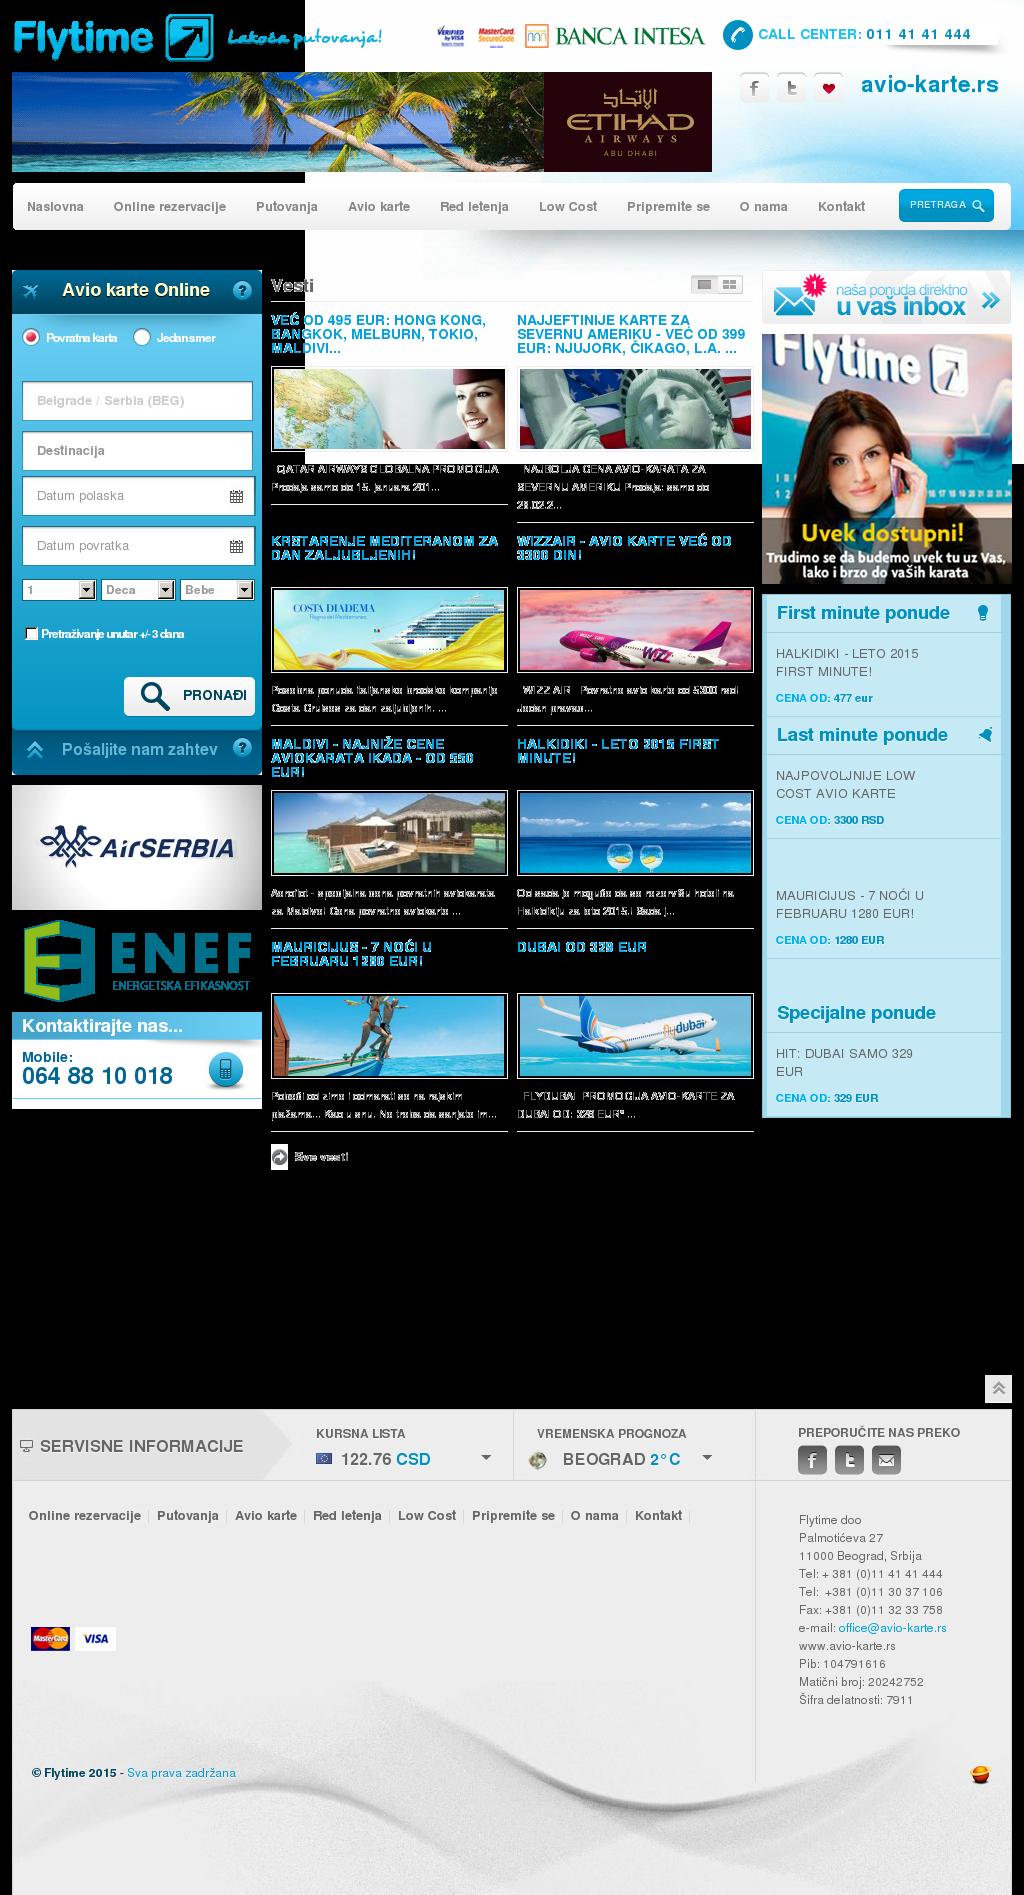 Avio Karte.Flytime Avio Karte Rs Competitors Revenue And Employees